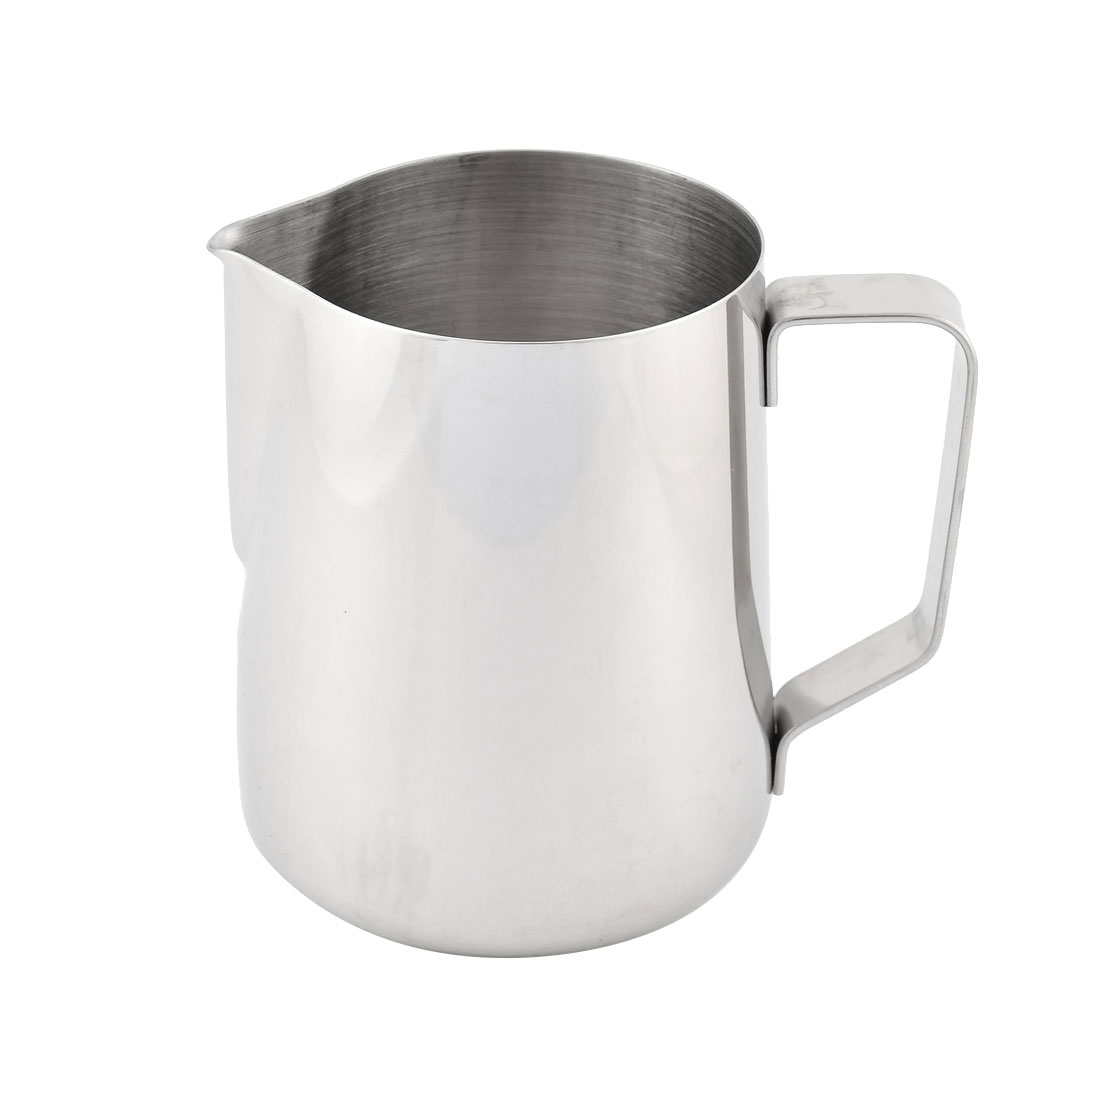 Stainless Steel Beaker Coffee Drink Measuring Bottle Cup 600ml Capacity Silver Tone